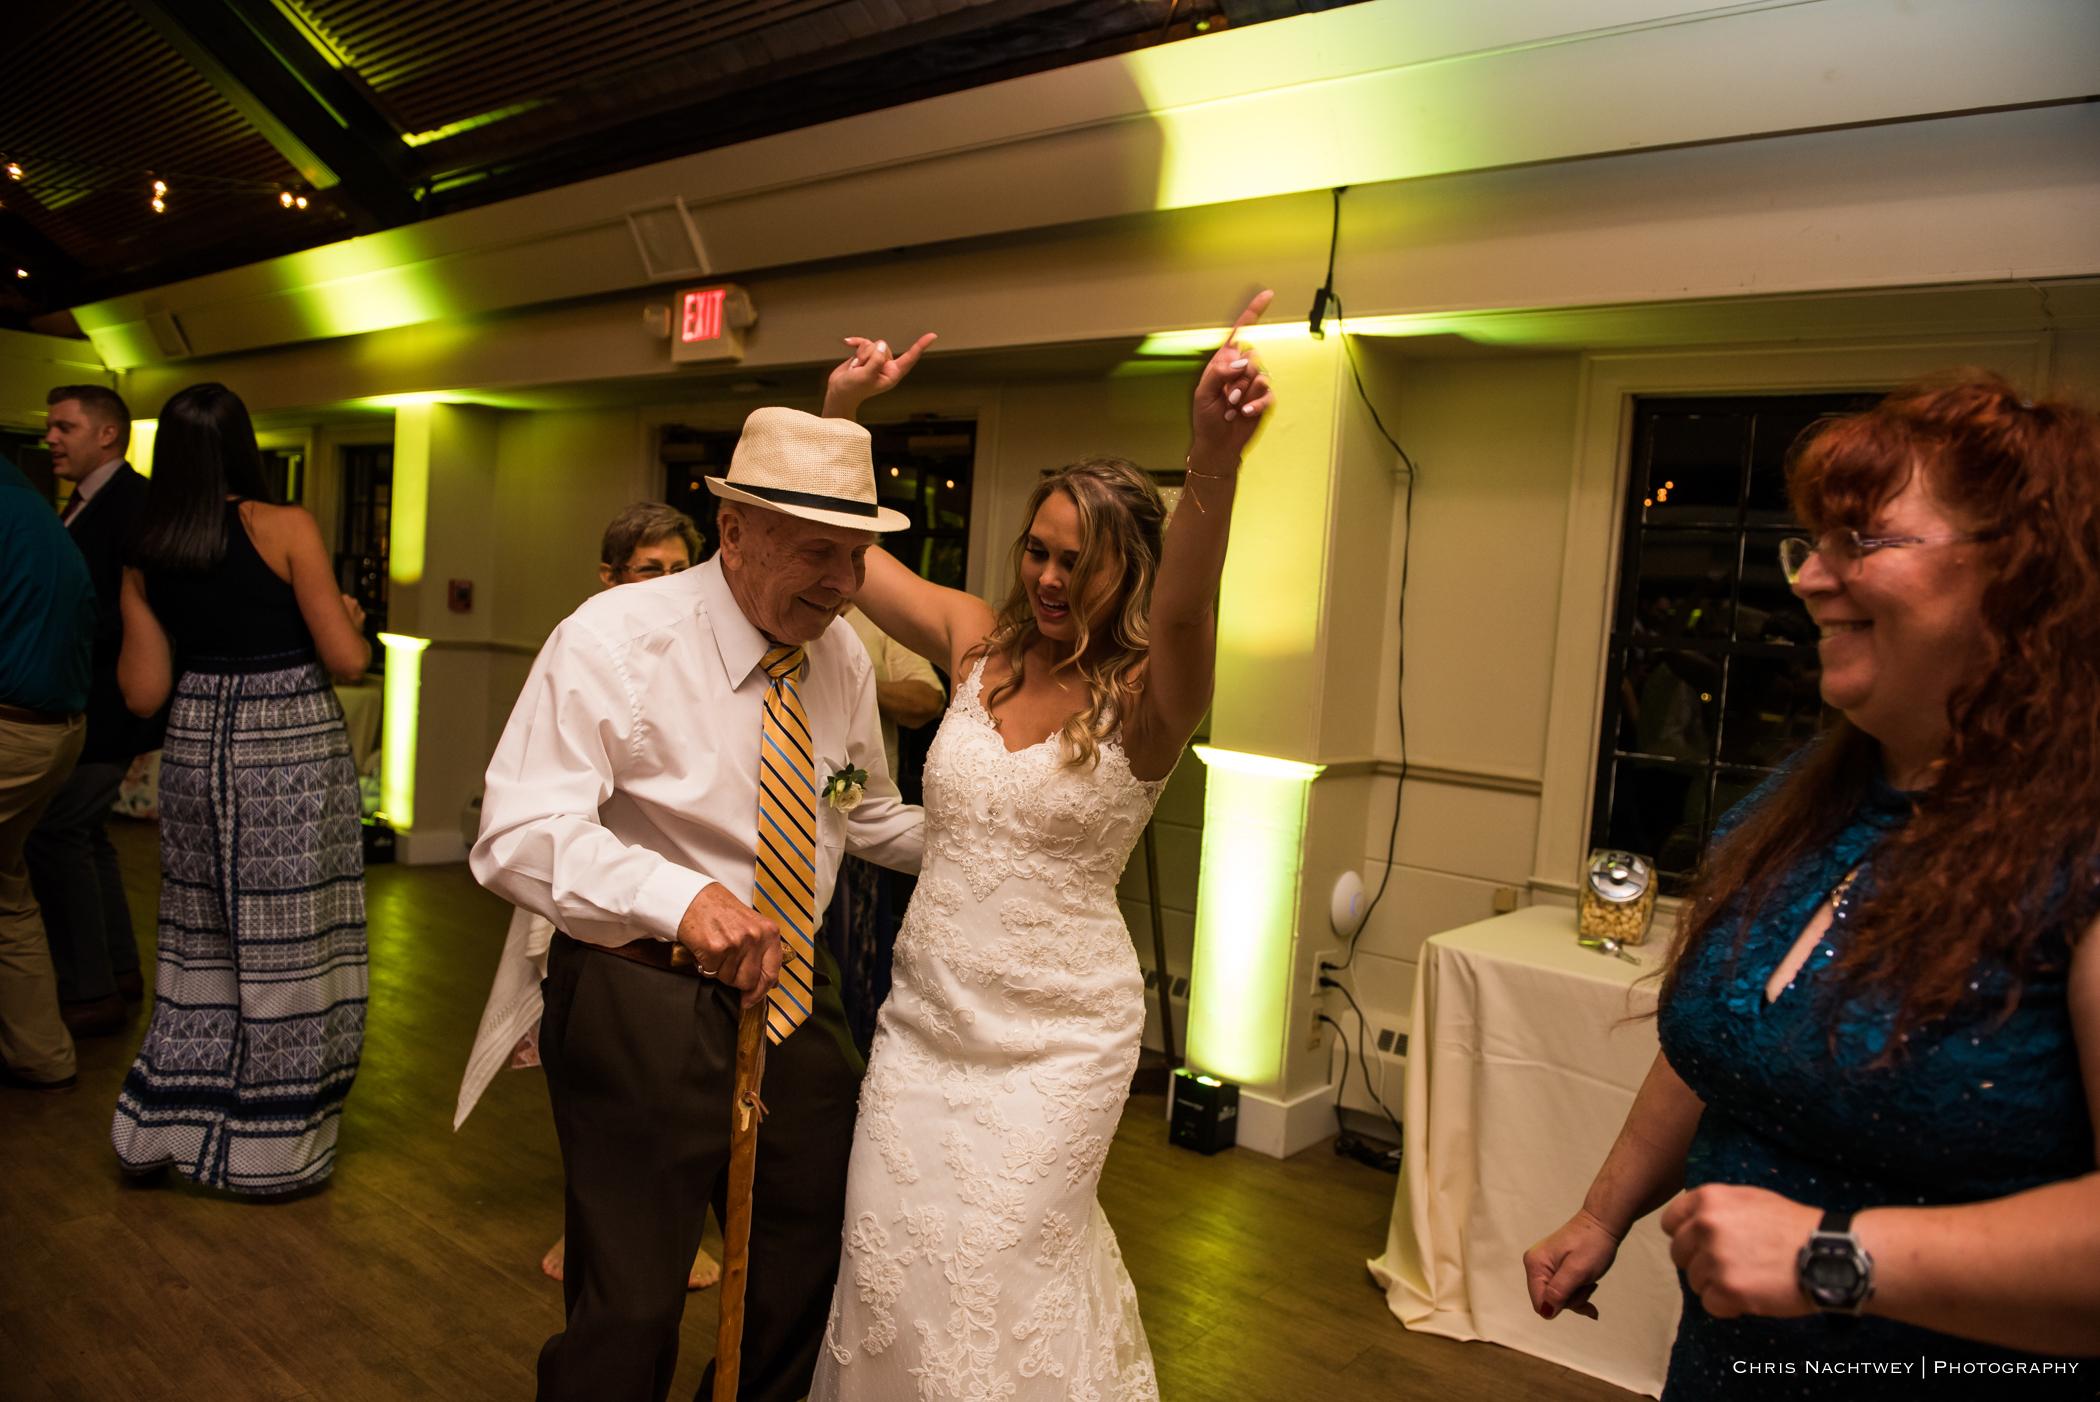 mystic-ct-artistic-wedding-photographers-chris-nachtwey-tany-mike-2017-56.jpg